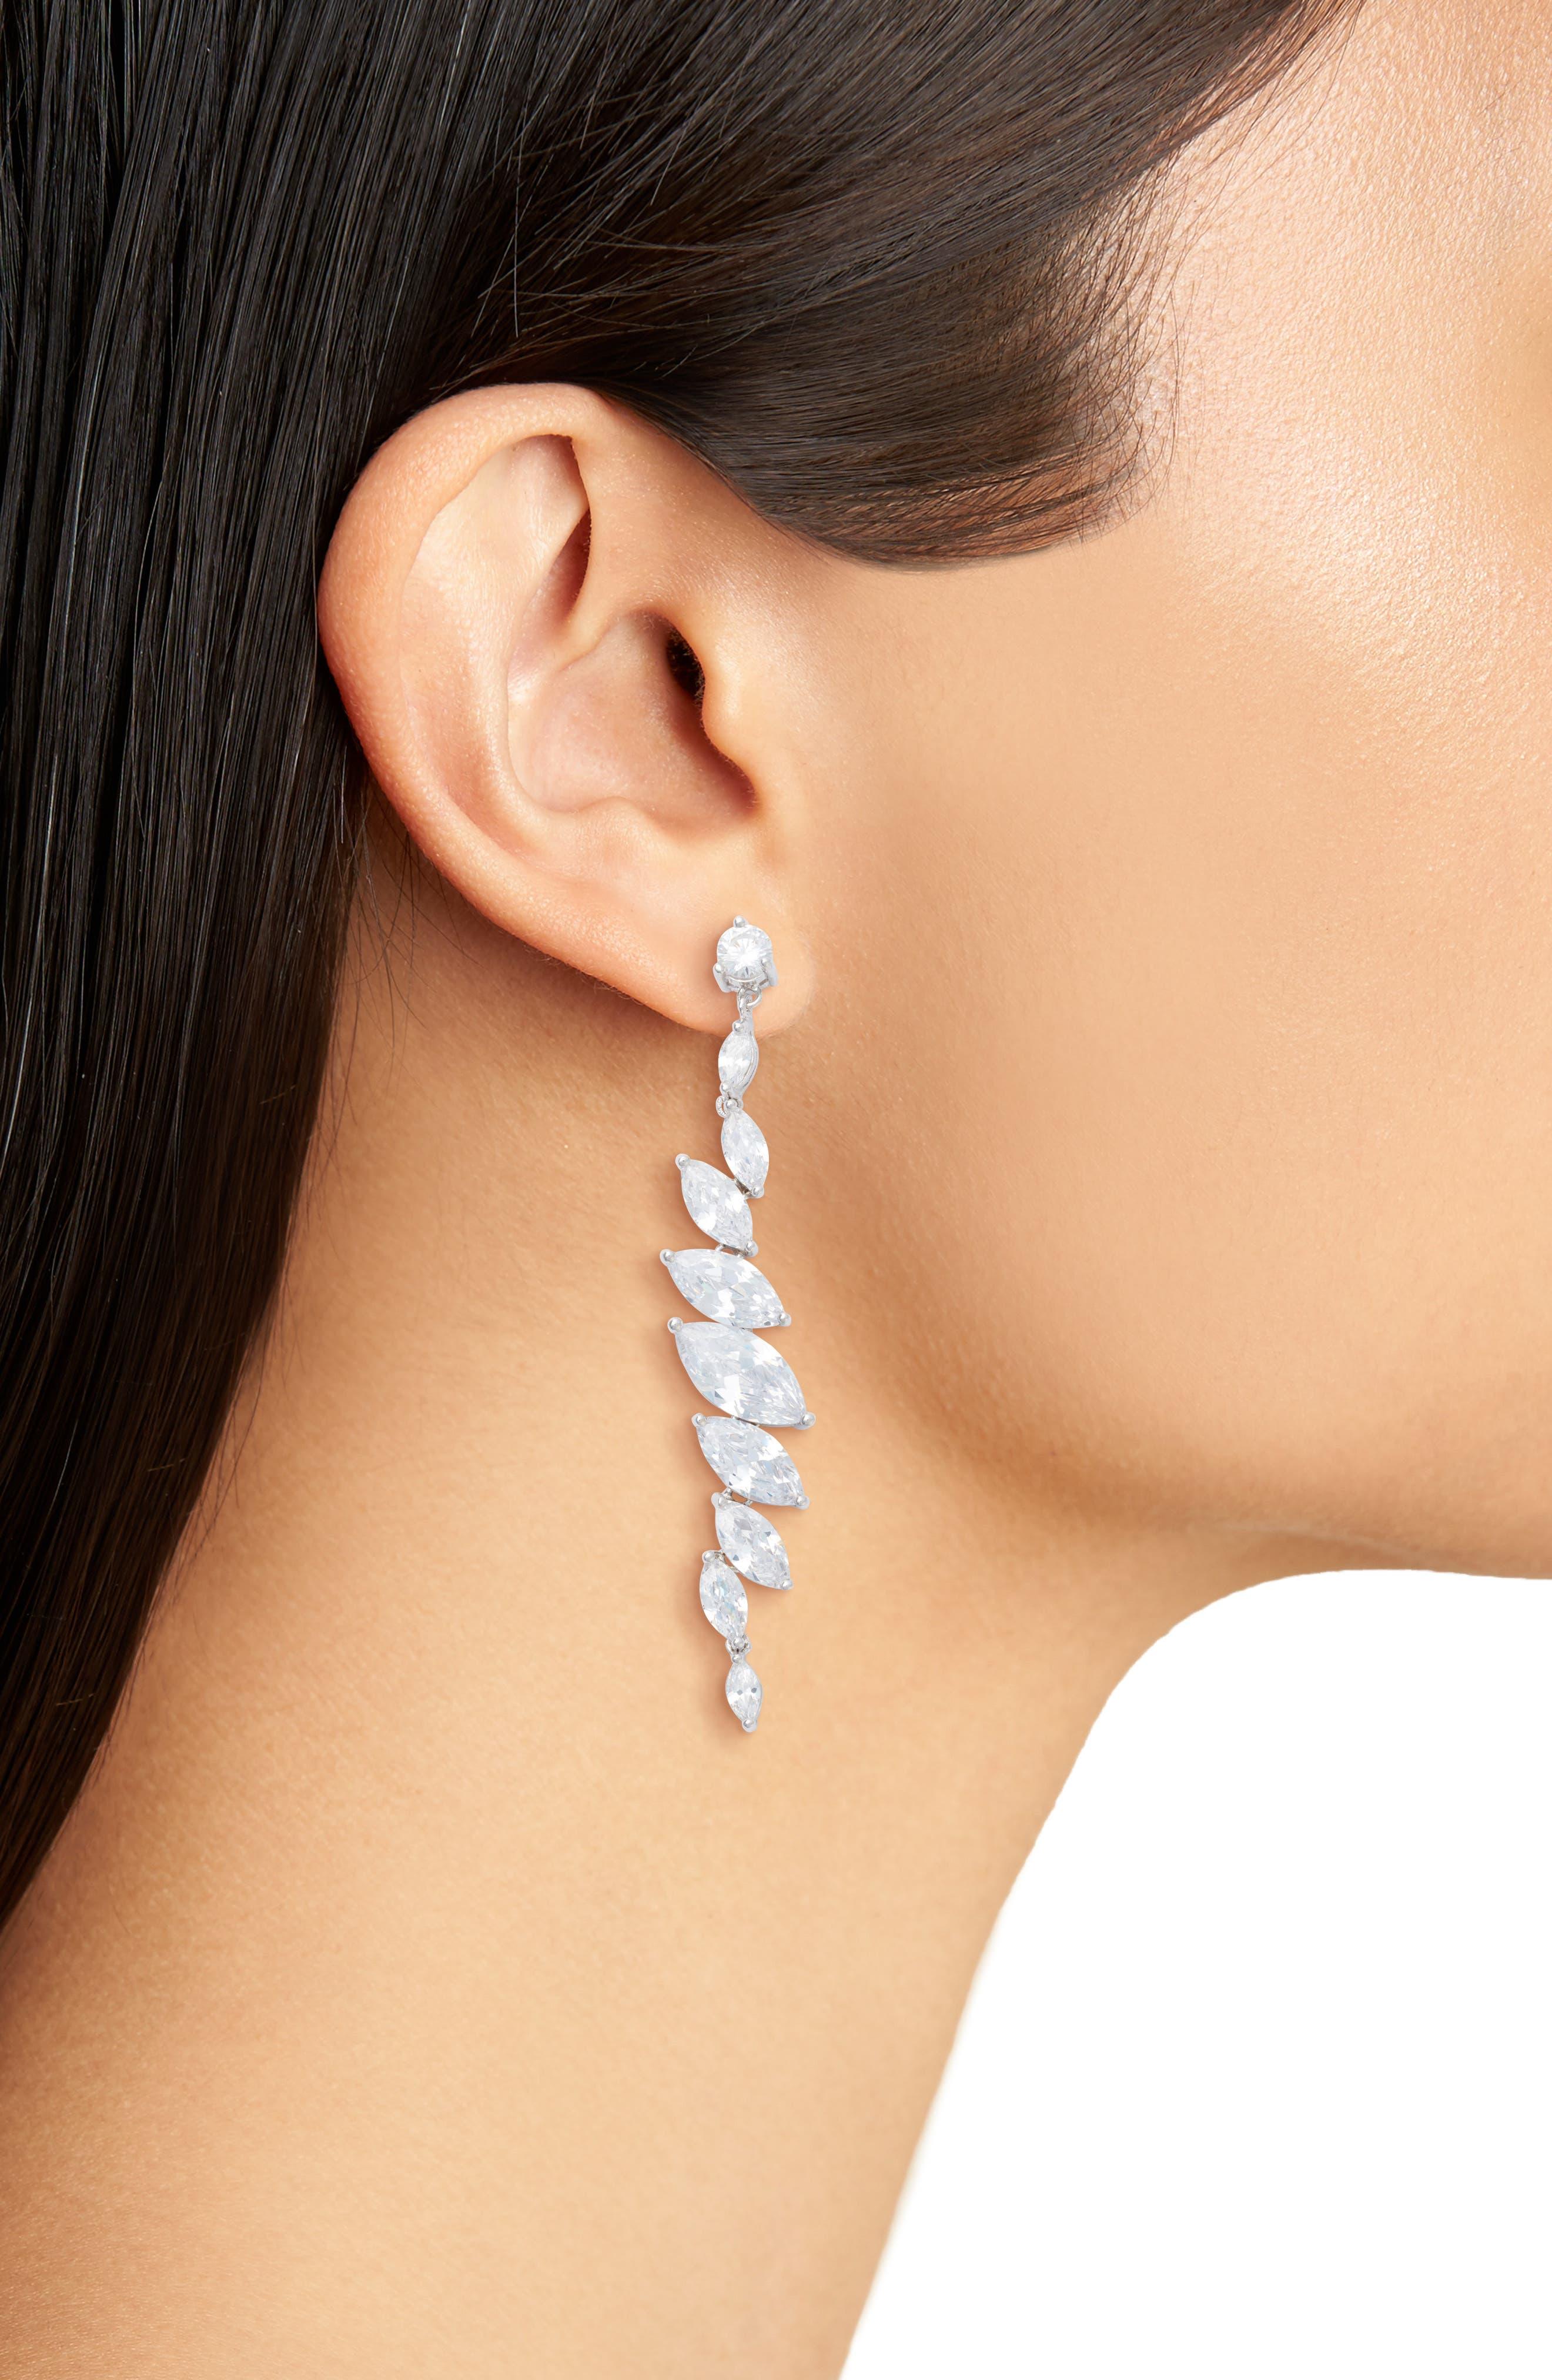 Crystal Drop Earrings,                             Alternate thumbnail 2, color,                             040